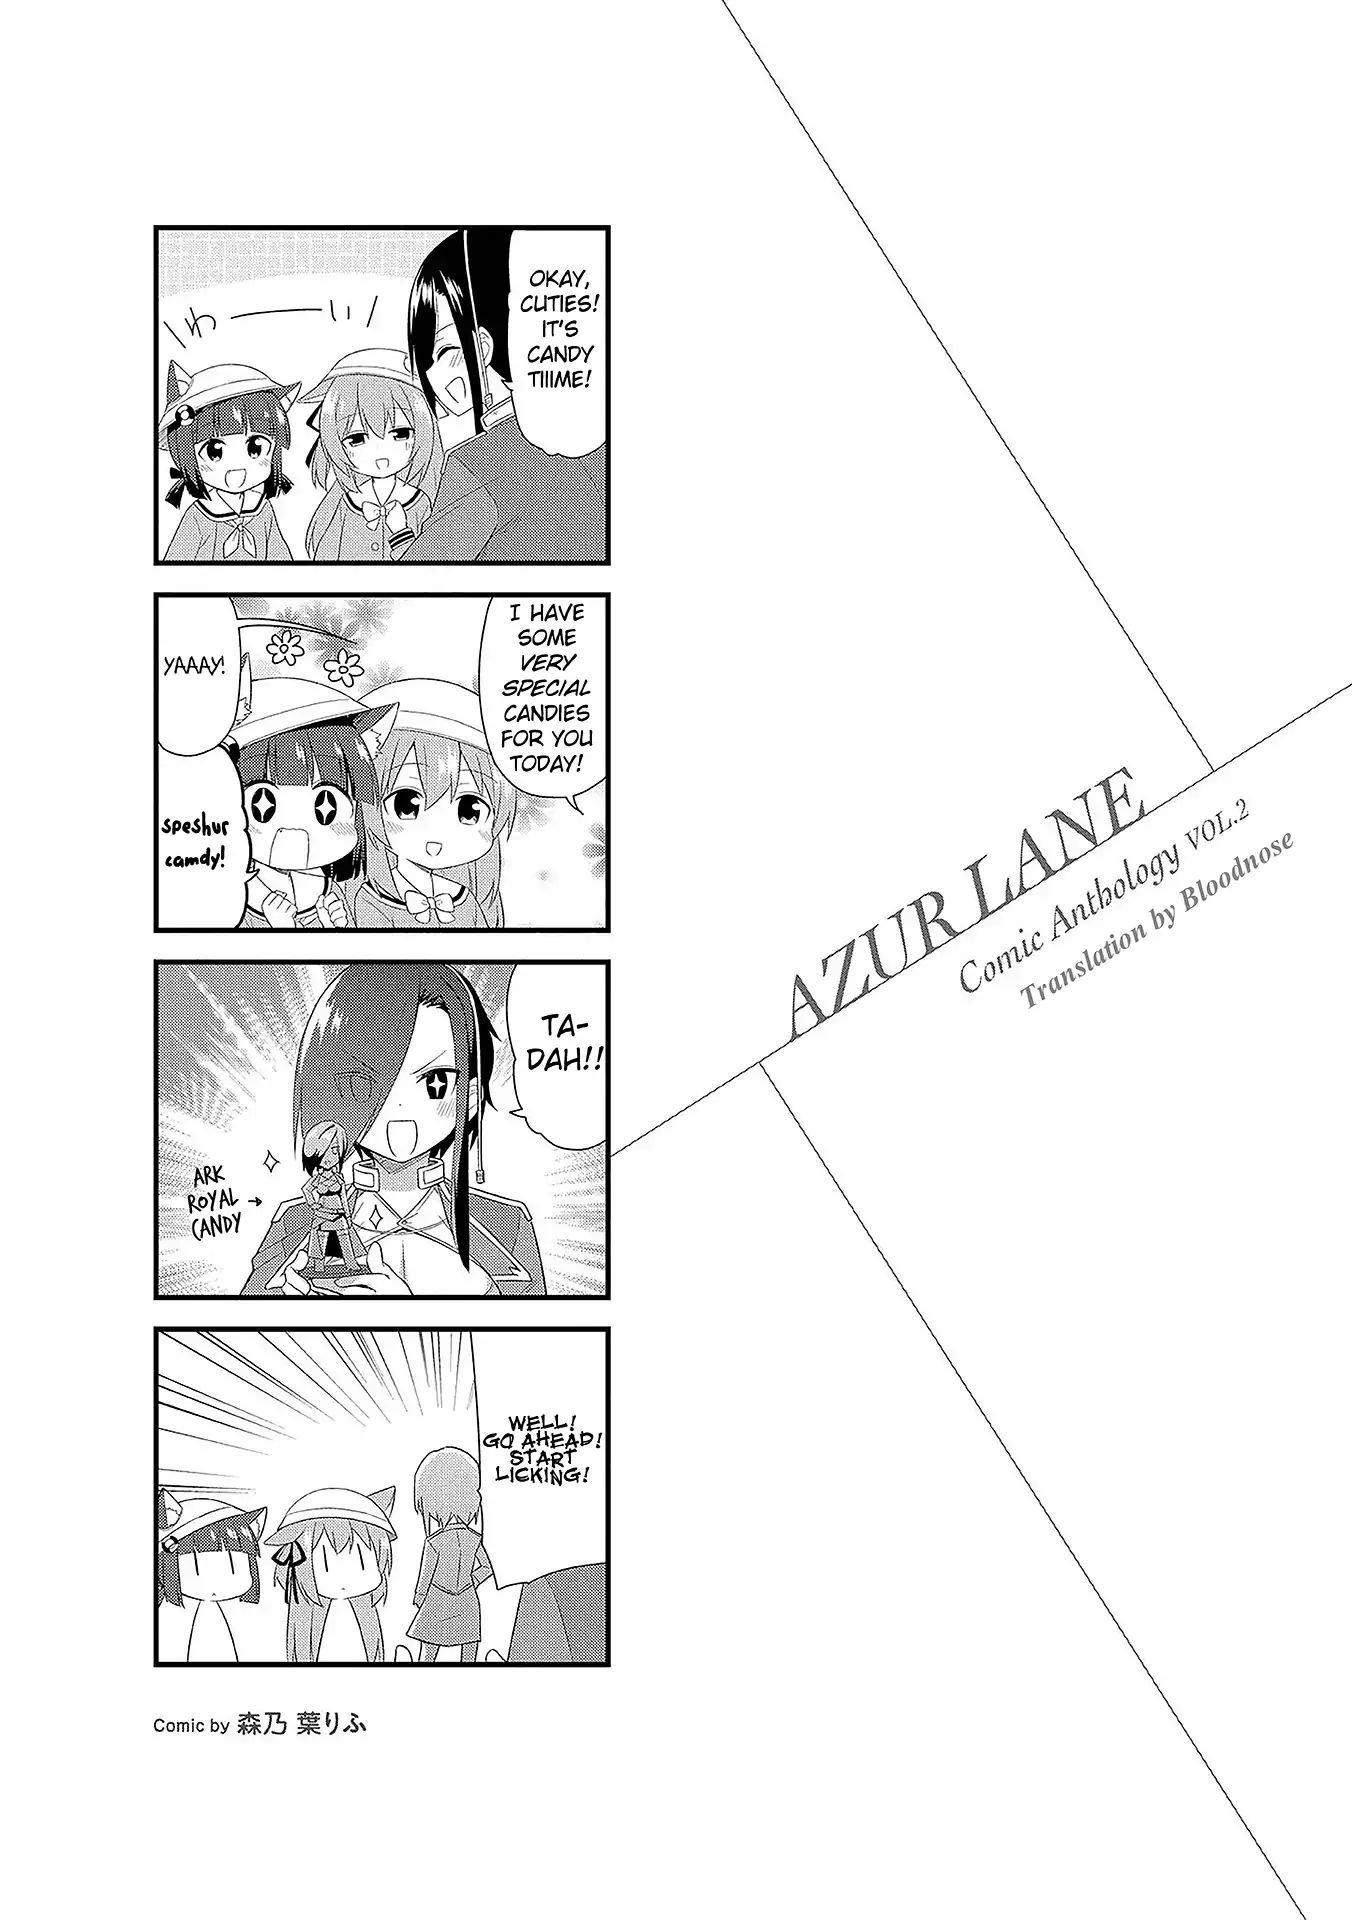 Manga Azur Lane Comic Anthology - Chapter 29 Page 1